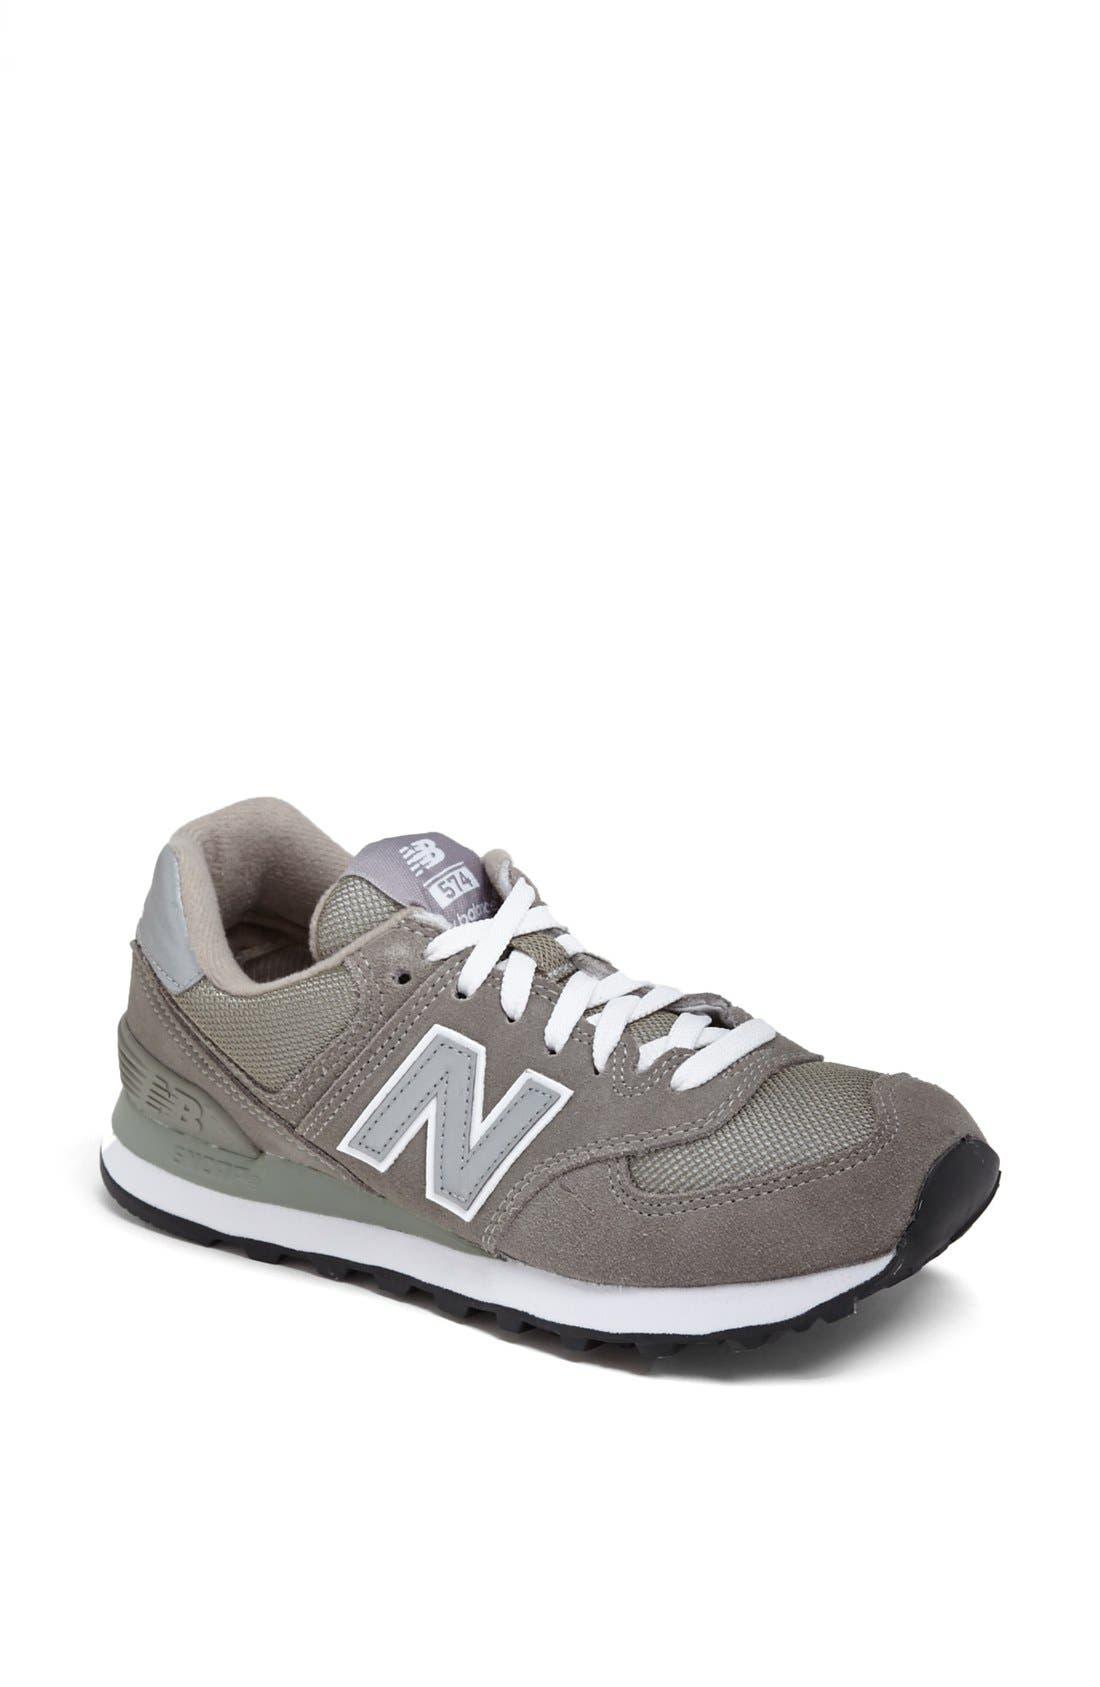 Main Image - New Balance '574' Sneaker (Women)